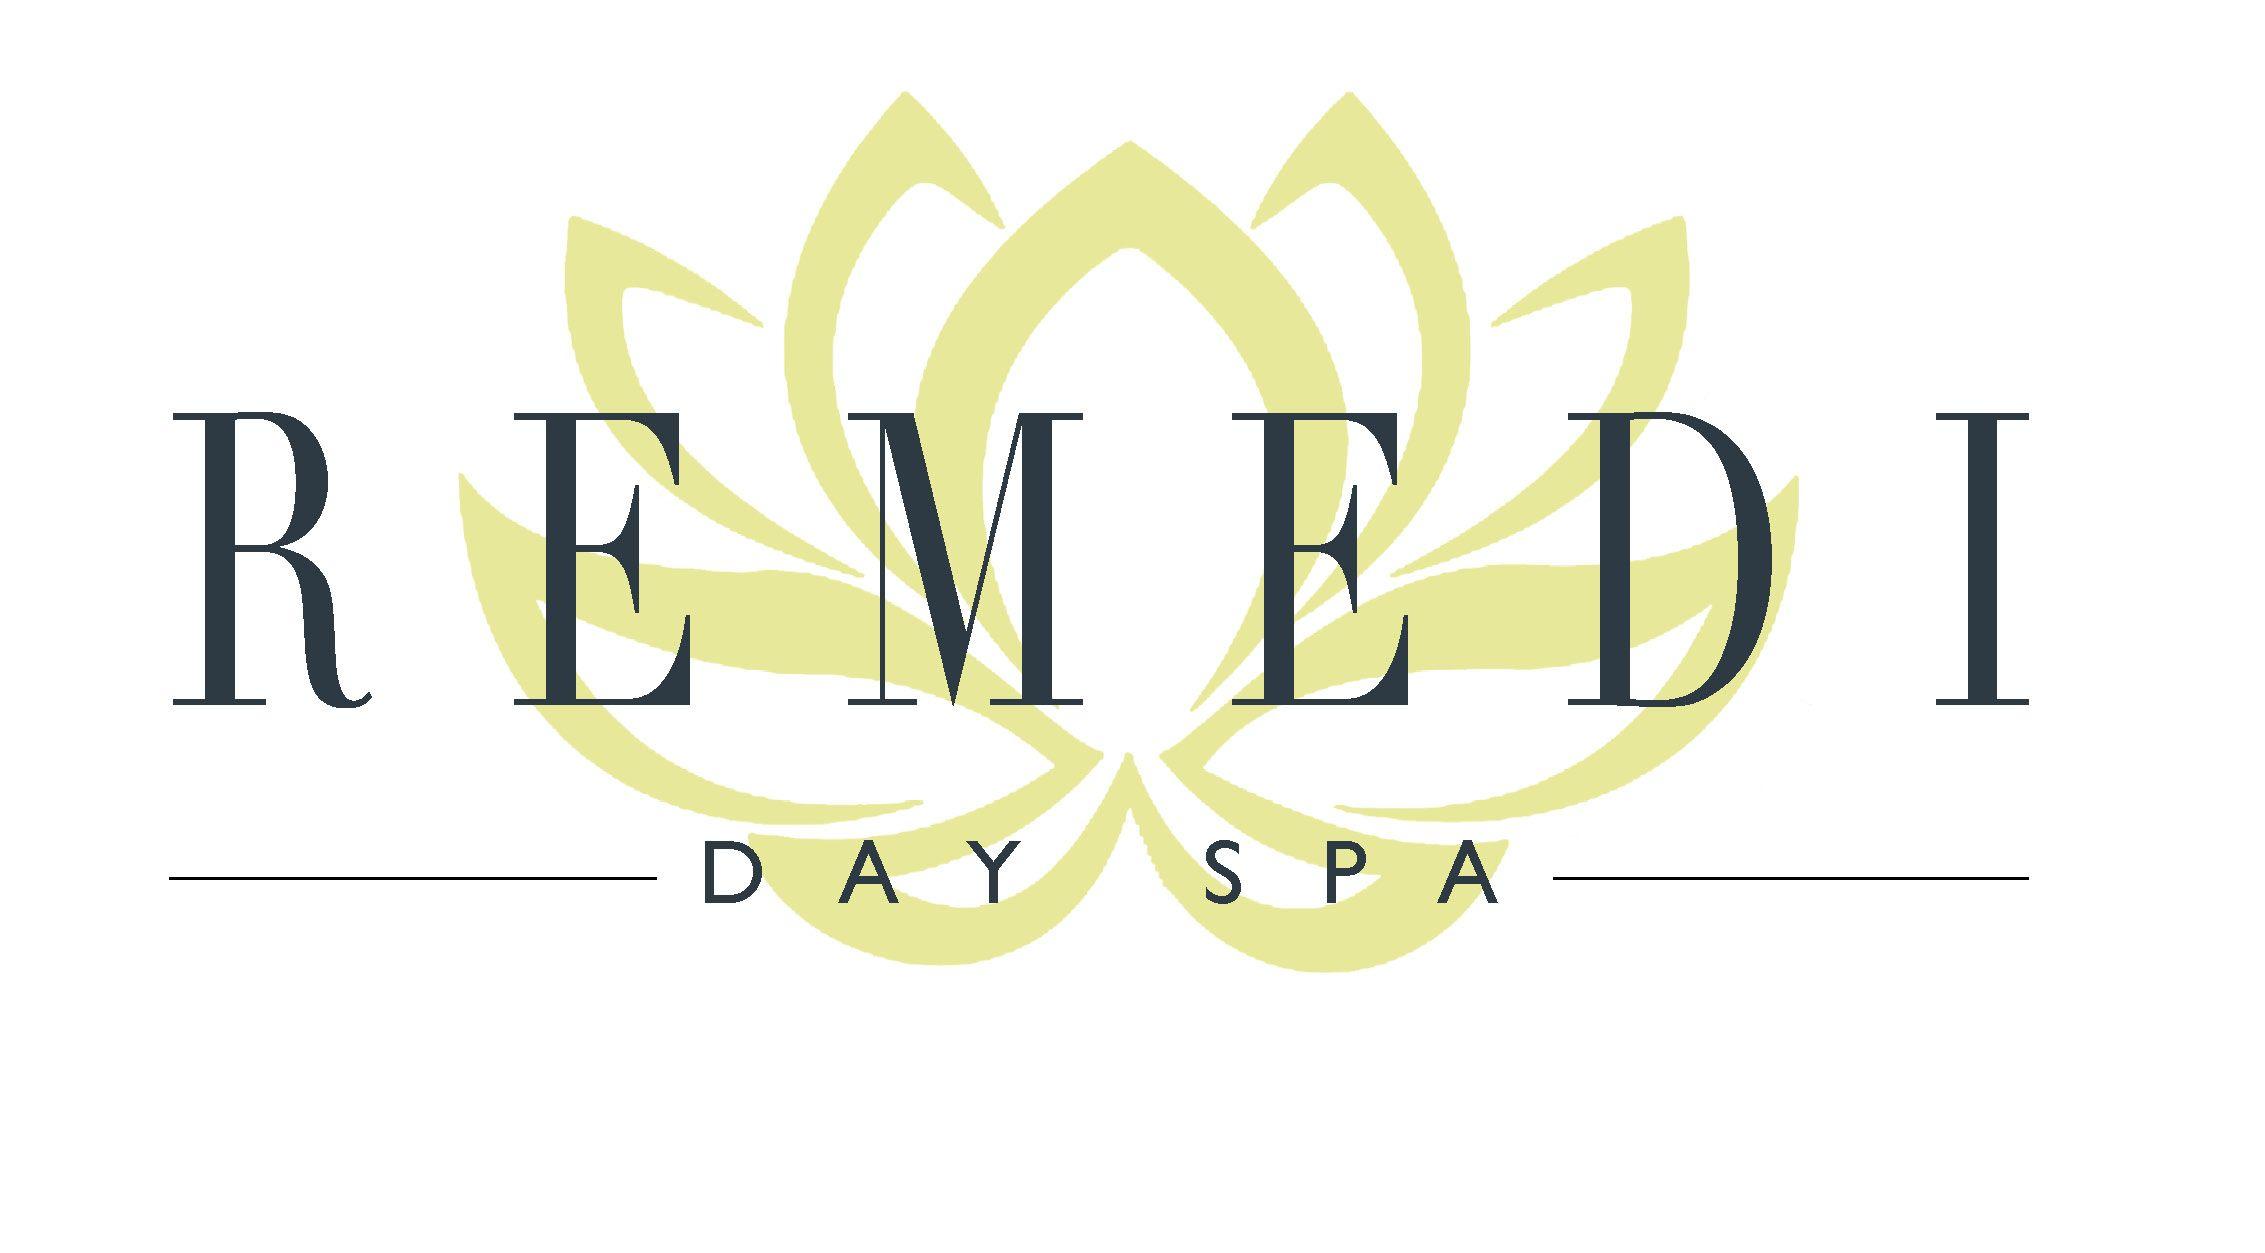 Day Spa in Pa Remedi Day Spa Spa day, Day spa decor